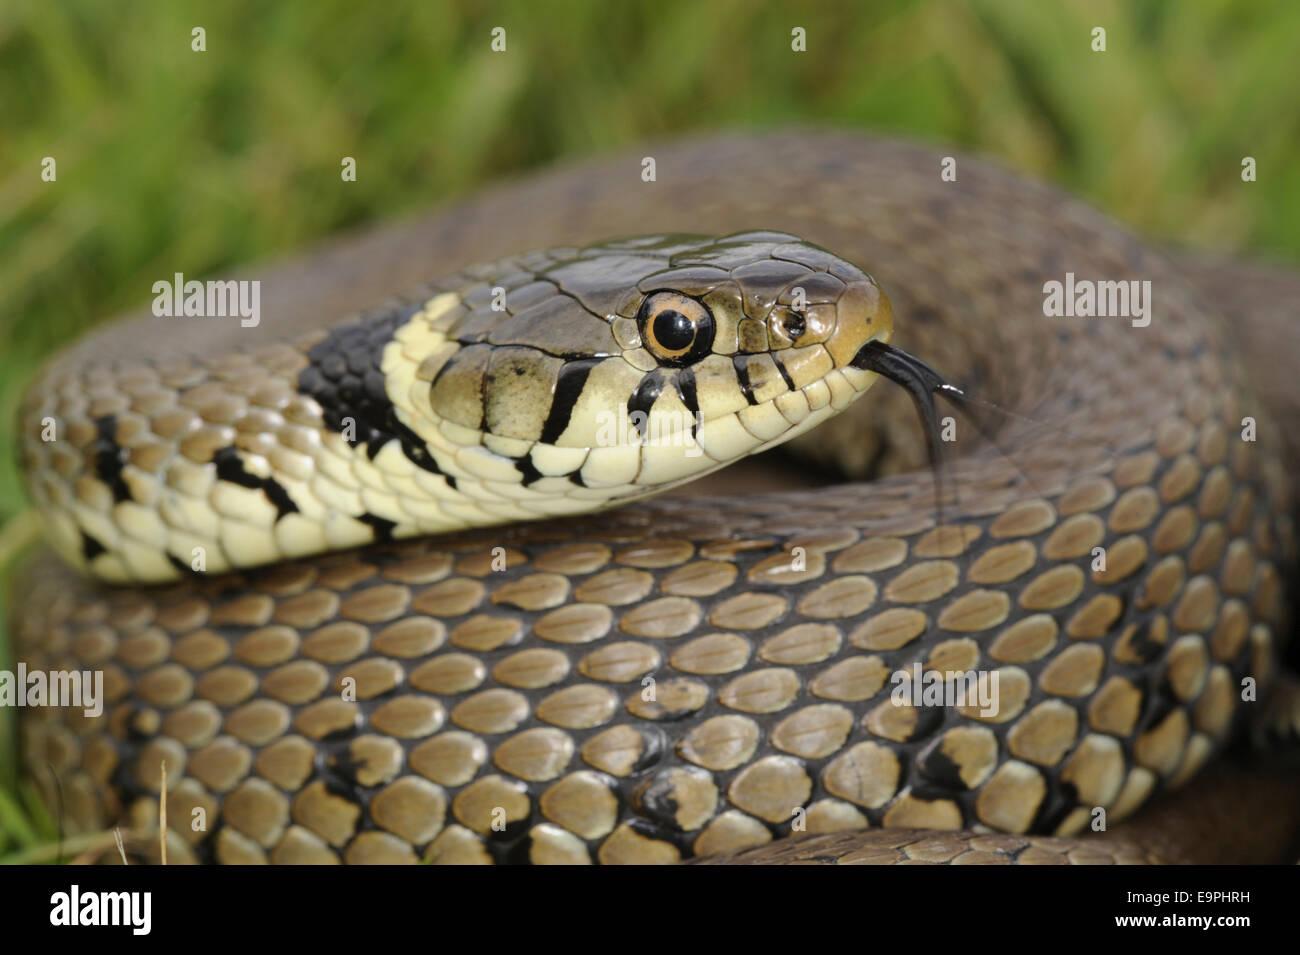 Grass Snake - Natrix natrix - Stock Image